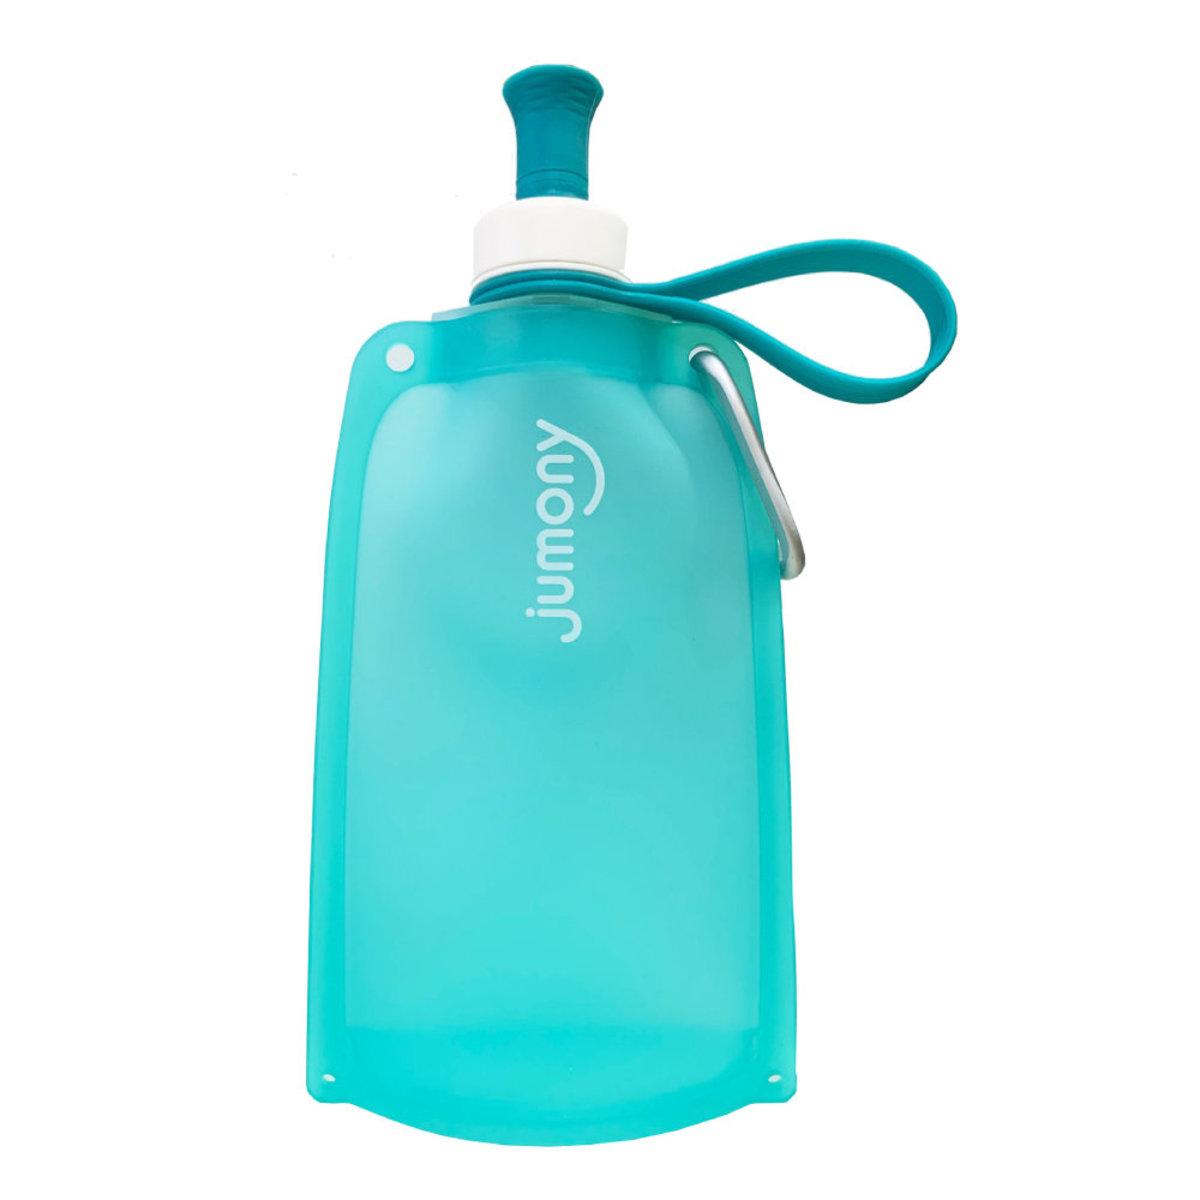 Jumony簡約便攜捲式矽膠水瓶 #薄荷藍 550ml [平行進口] (8809499754119)